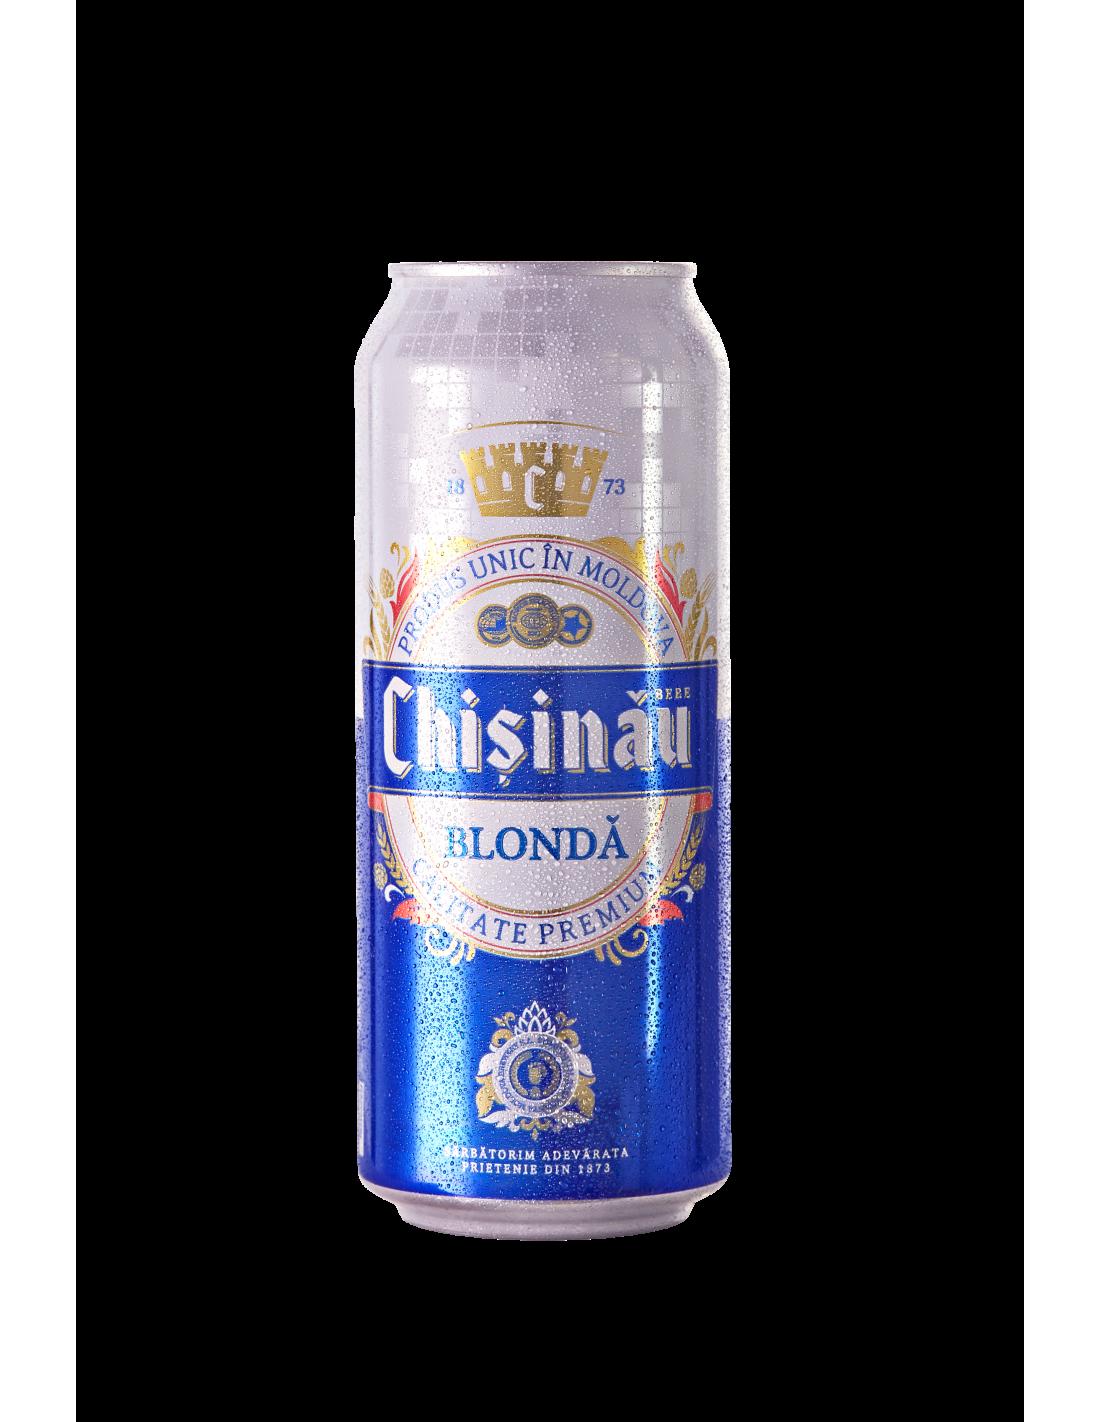 Chisinau 0.5l